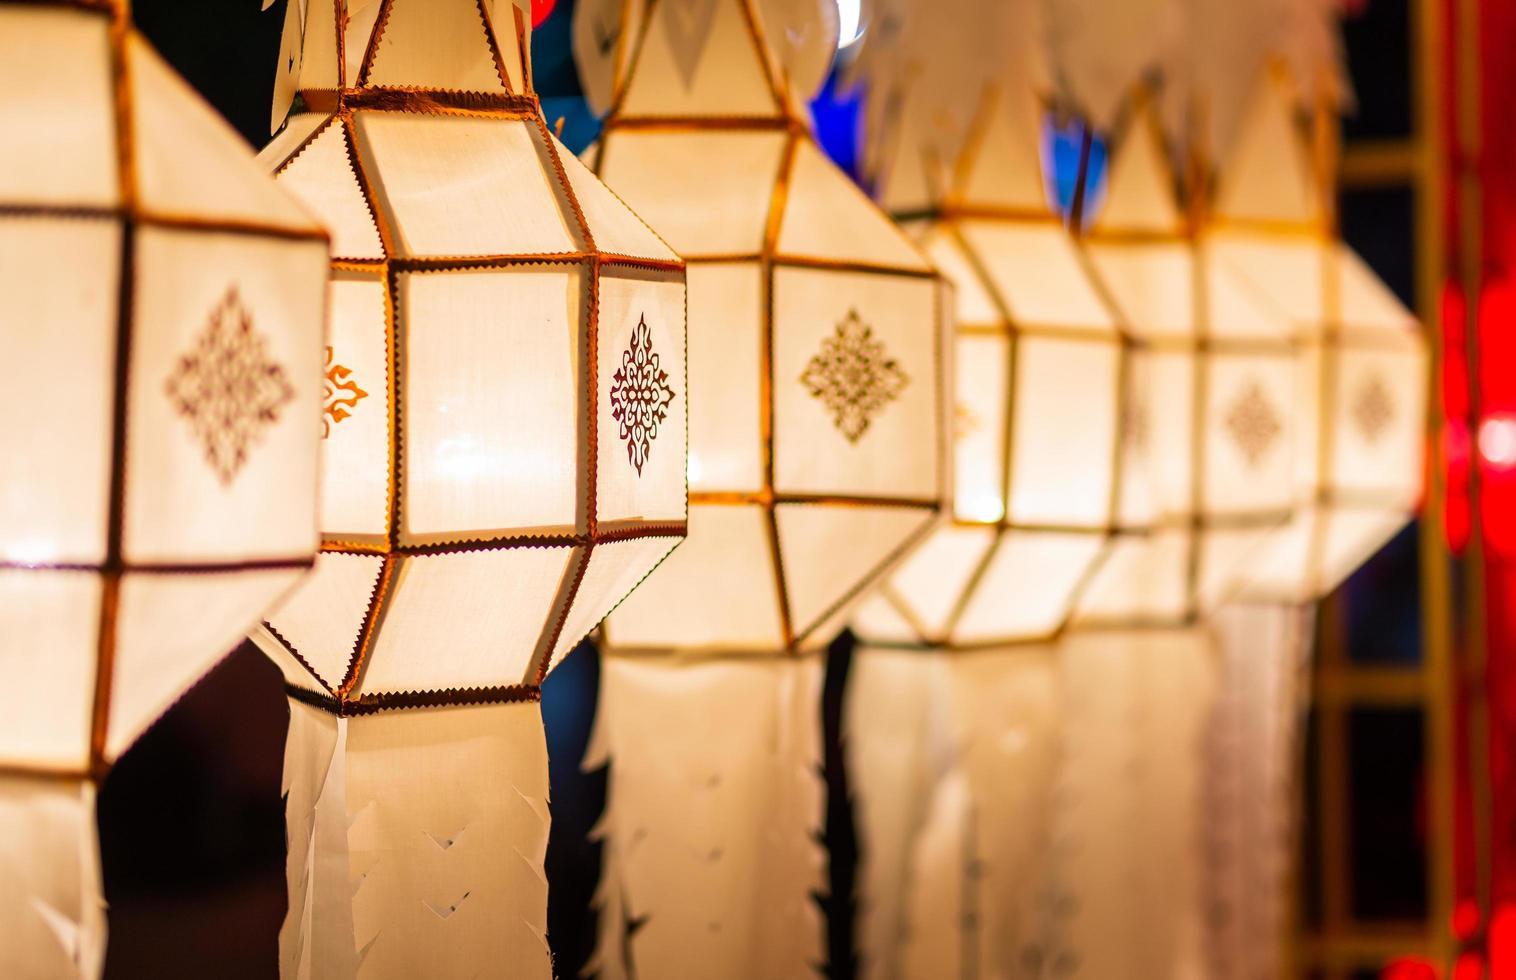 A string of Nanna lanterns fill festival hall in Thailand photo